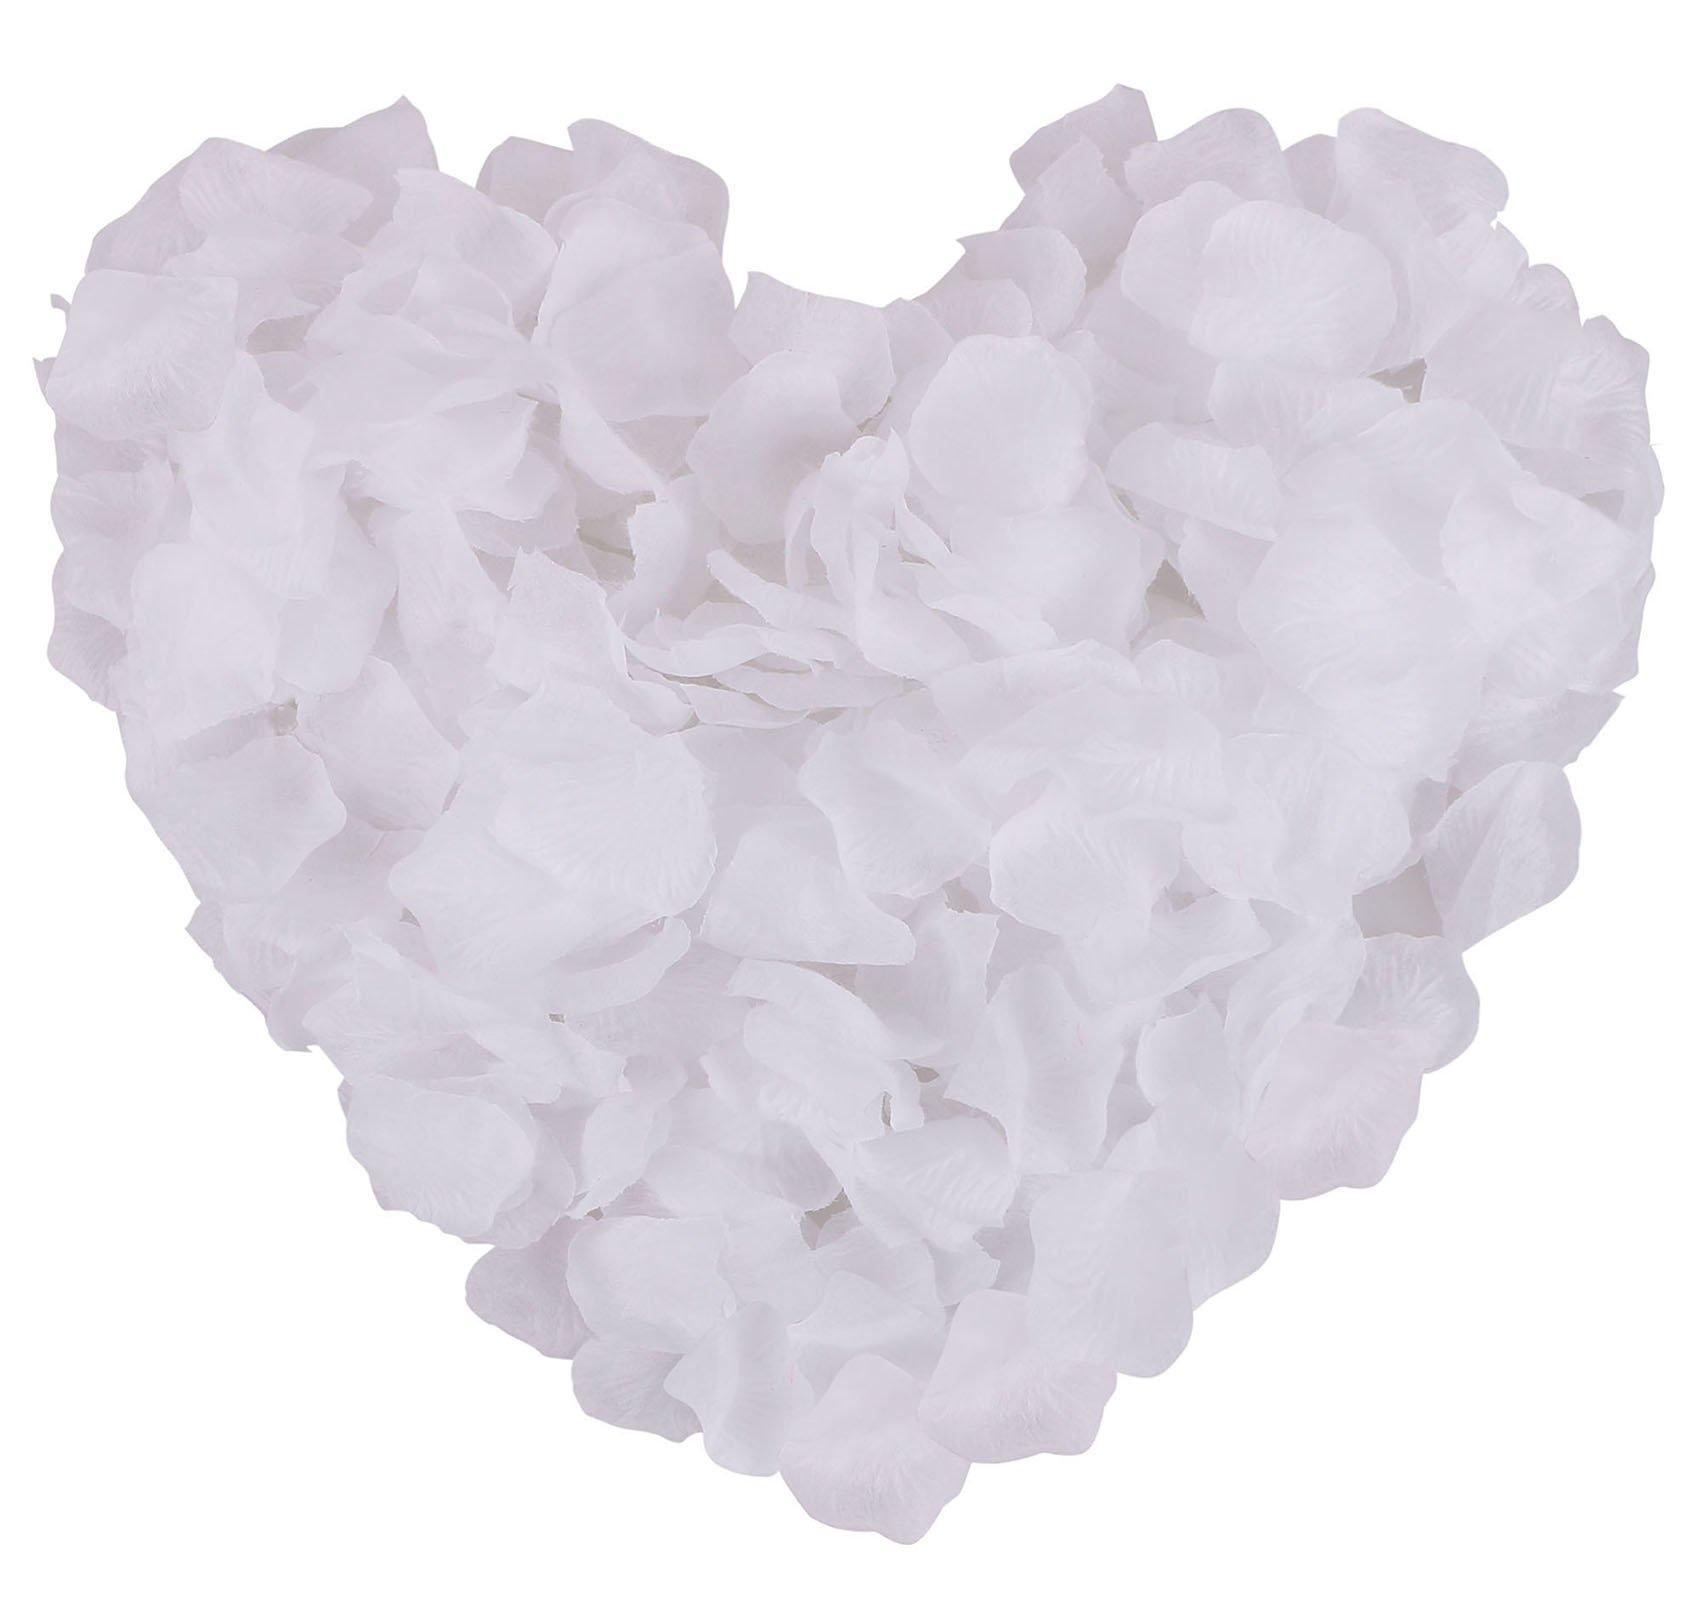 silk flower arrangements jasmine 1000 pcs non-woven rose petals artificial fabric flower for valentine ceremony home bouquet,white